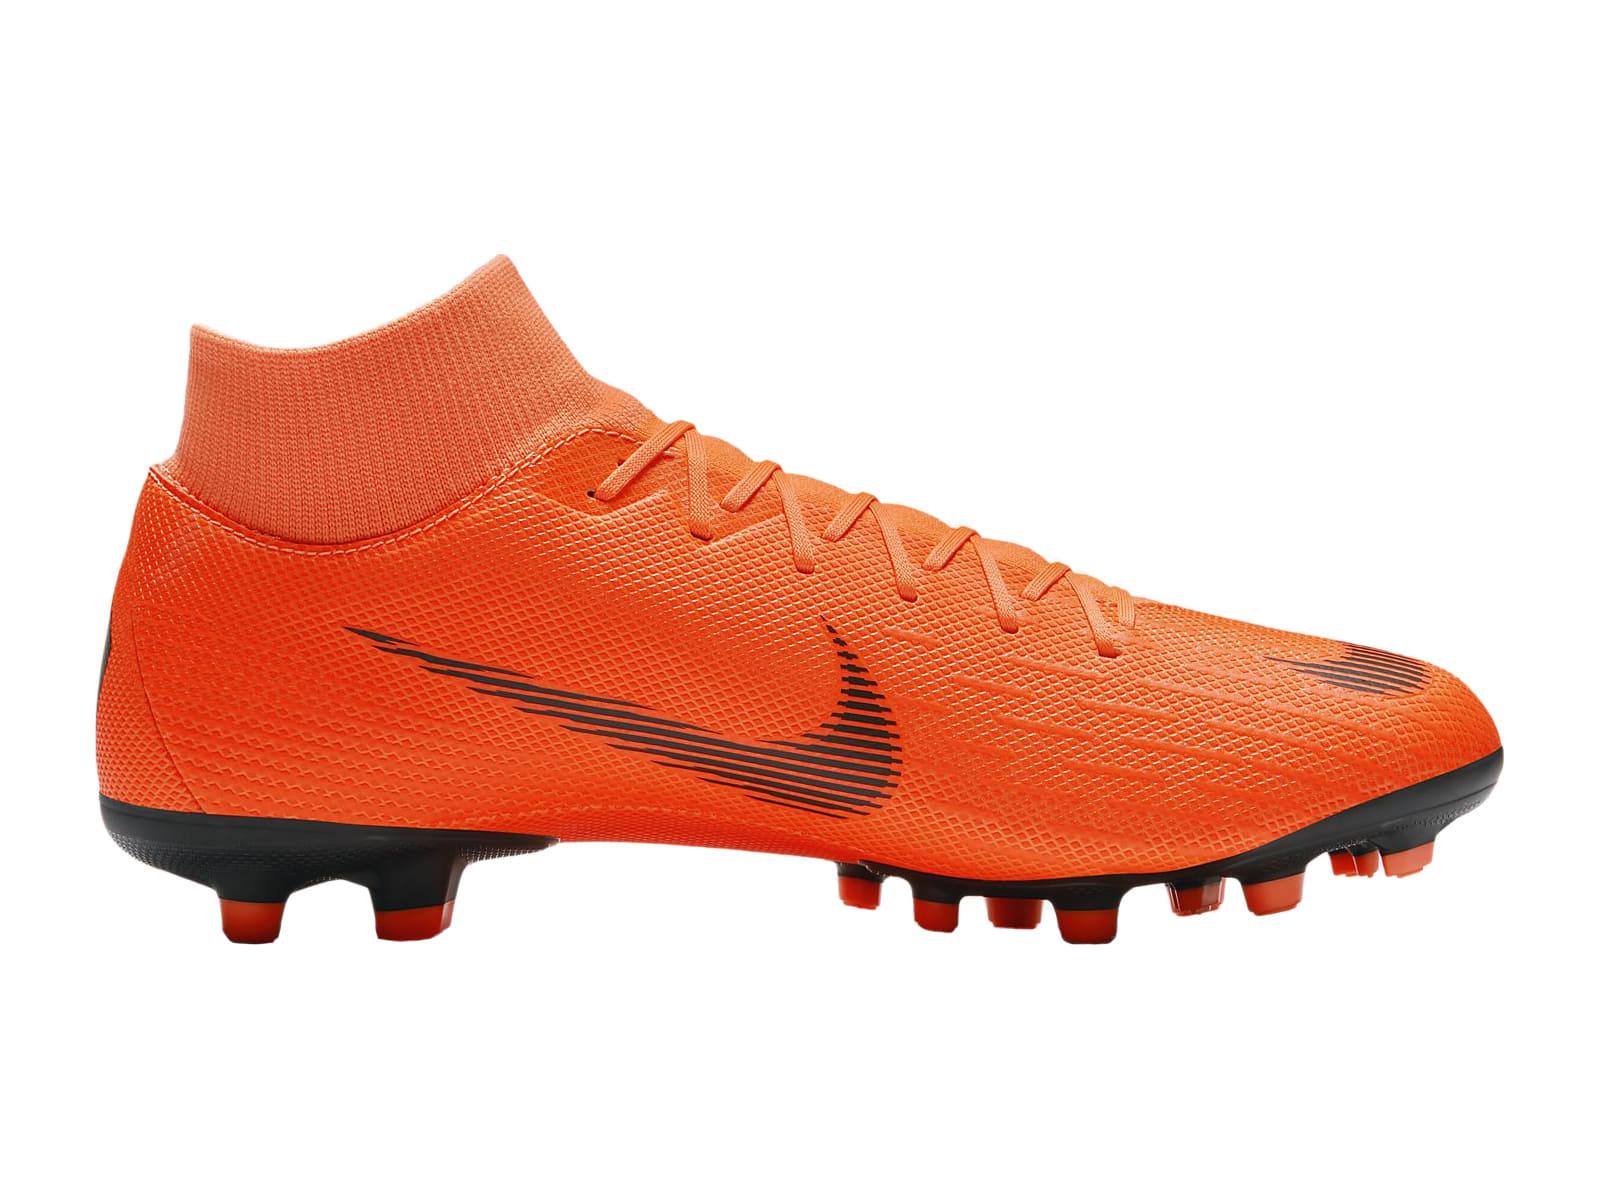 quality design 55bd4 55563 Se detaljer. Nike